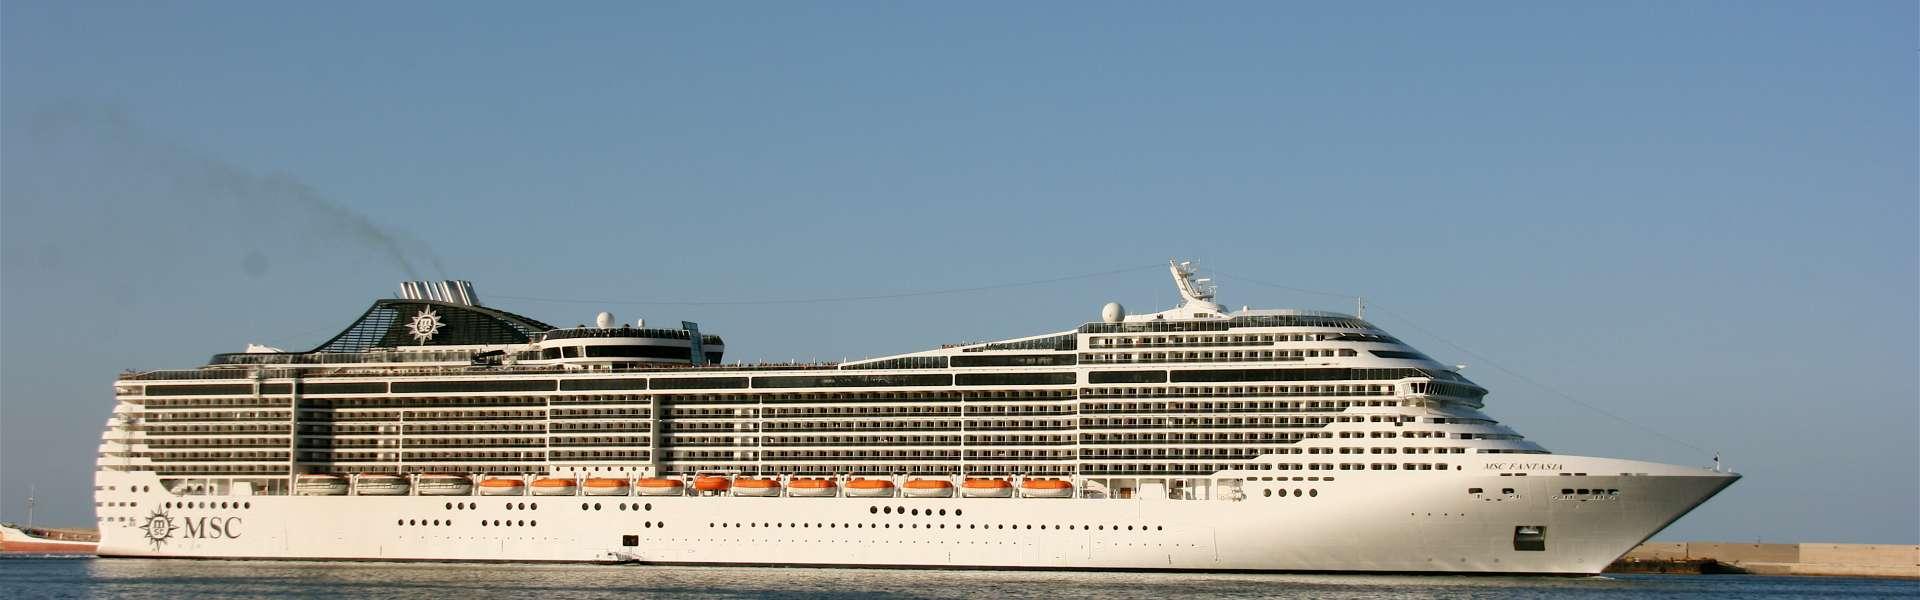 Croaziera 2019 - Mediterana de Vest (Marsilia) - MSC Cruises - MSC Fantasia - 7 nopti